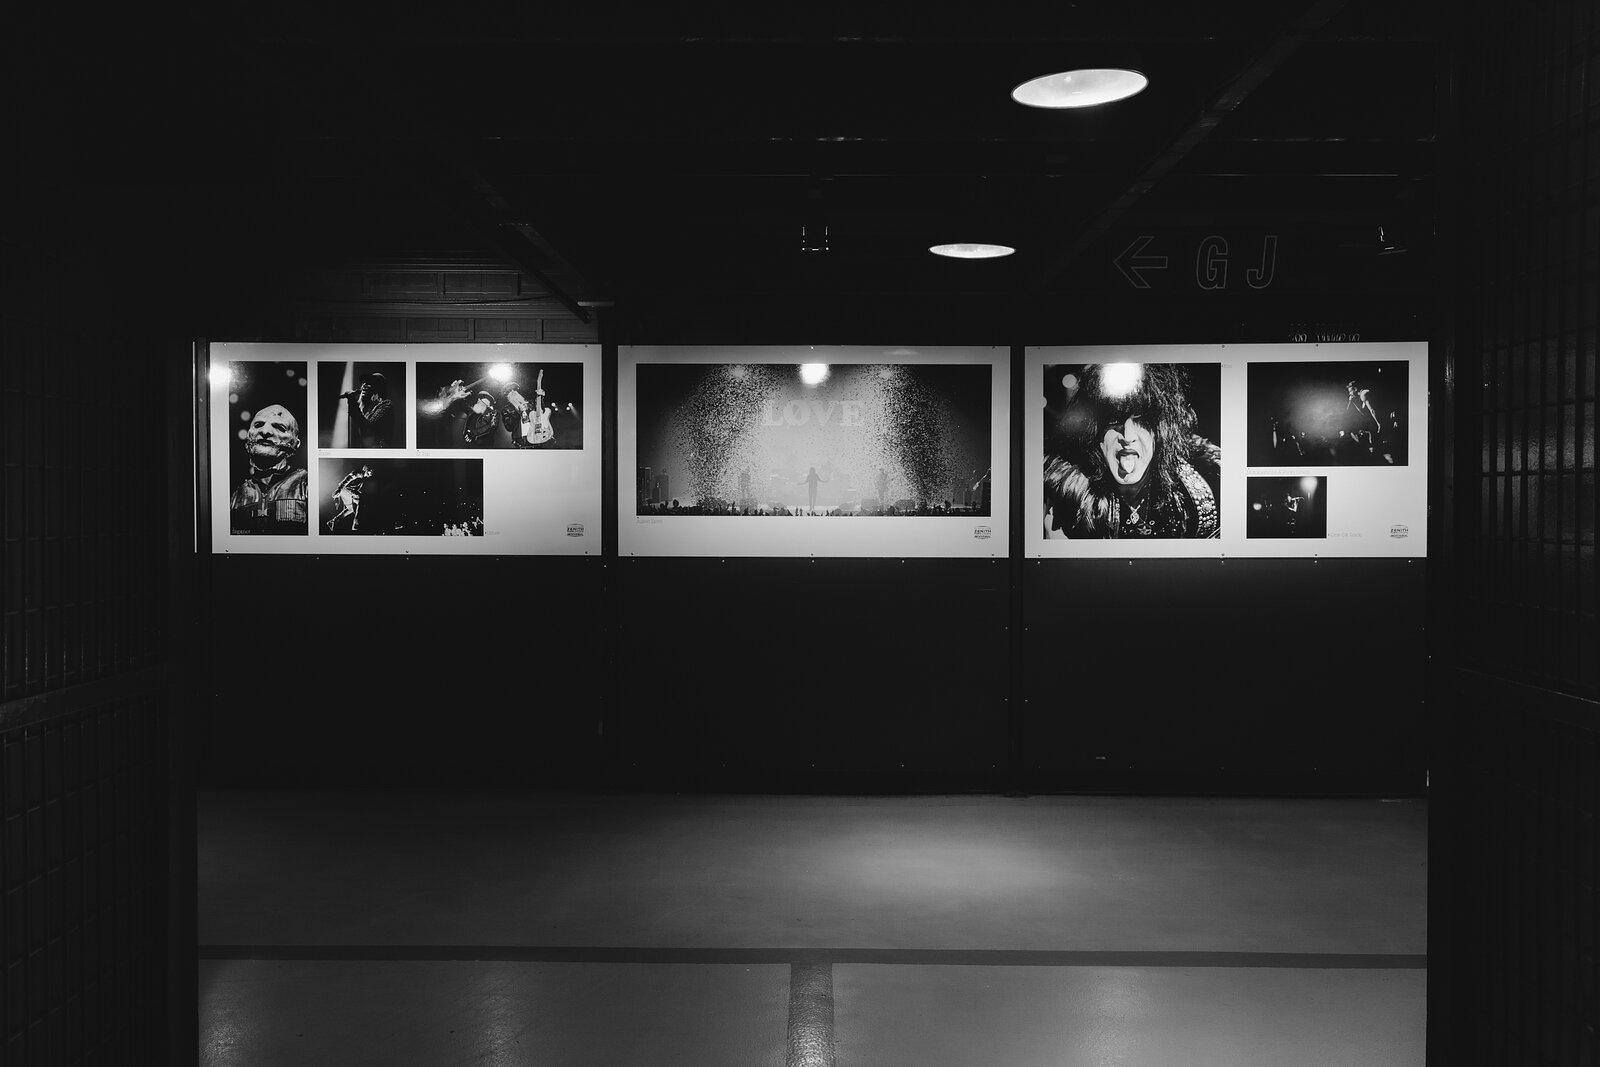 Exposition Zénith Paris 2016